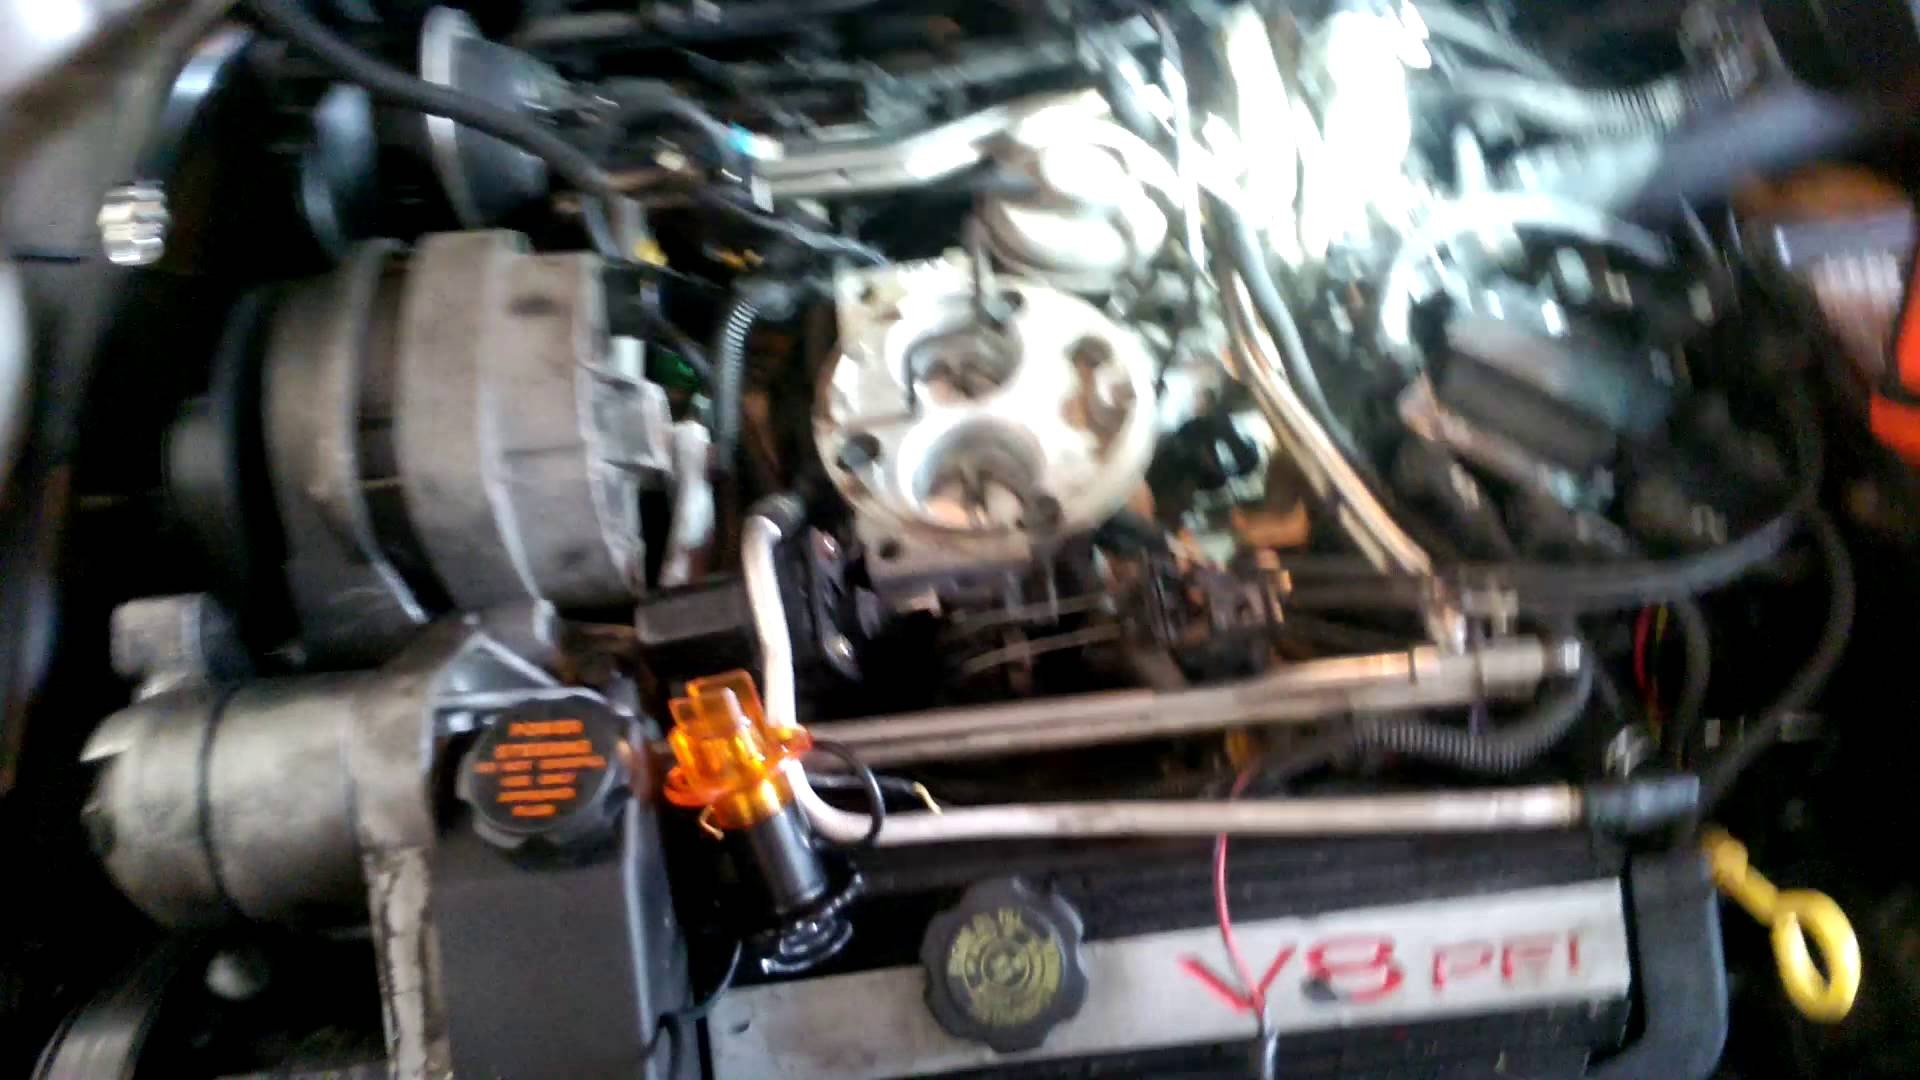 4 6 northstar Engine Diagram 2 92 4 9 Cadillac Deville Engine Miss Testing Fuel Injector Signal Of 4 6 northstar Engine Diagram 2